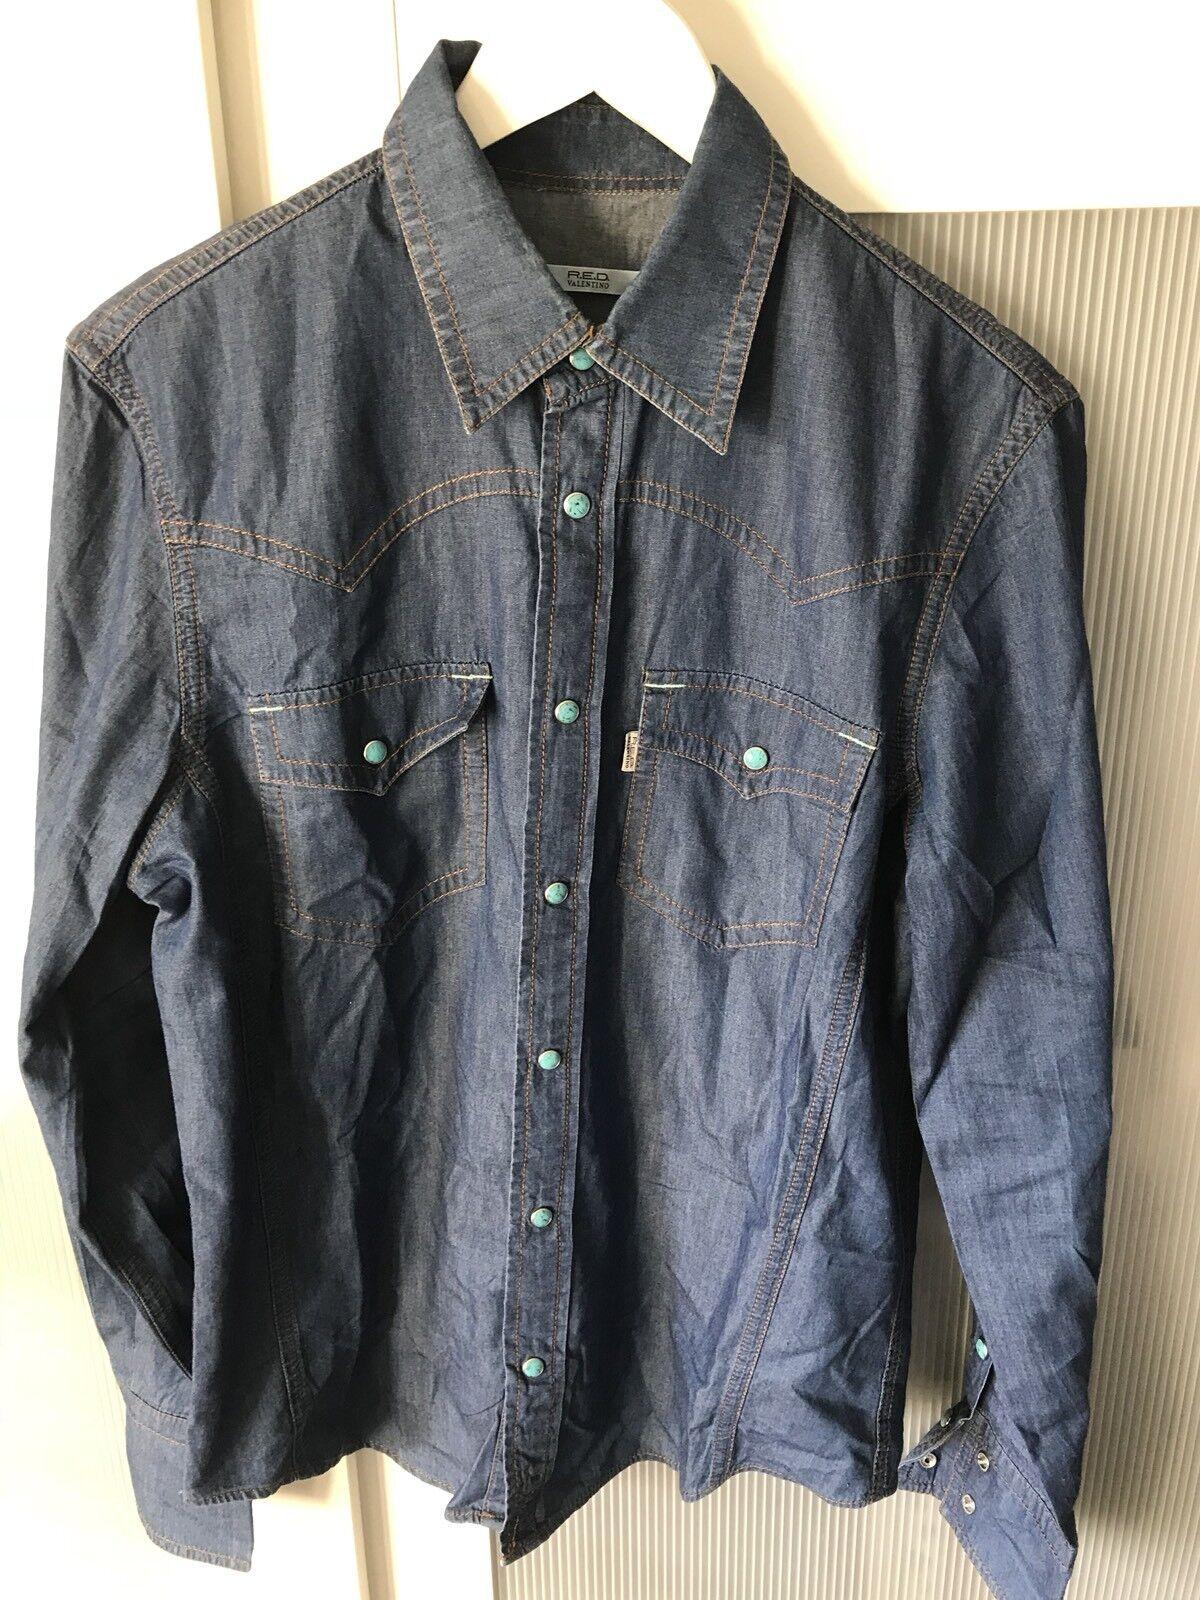 Valentino R.E.D men denim shirt cool design 100% authentic size 48